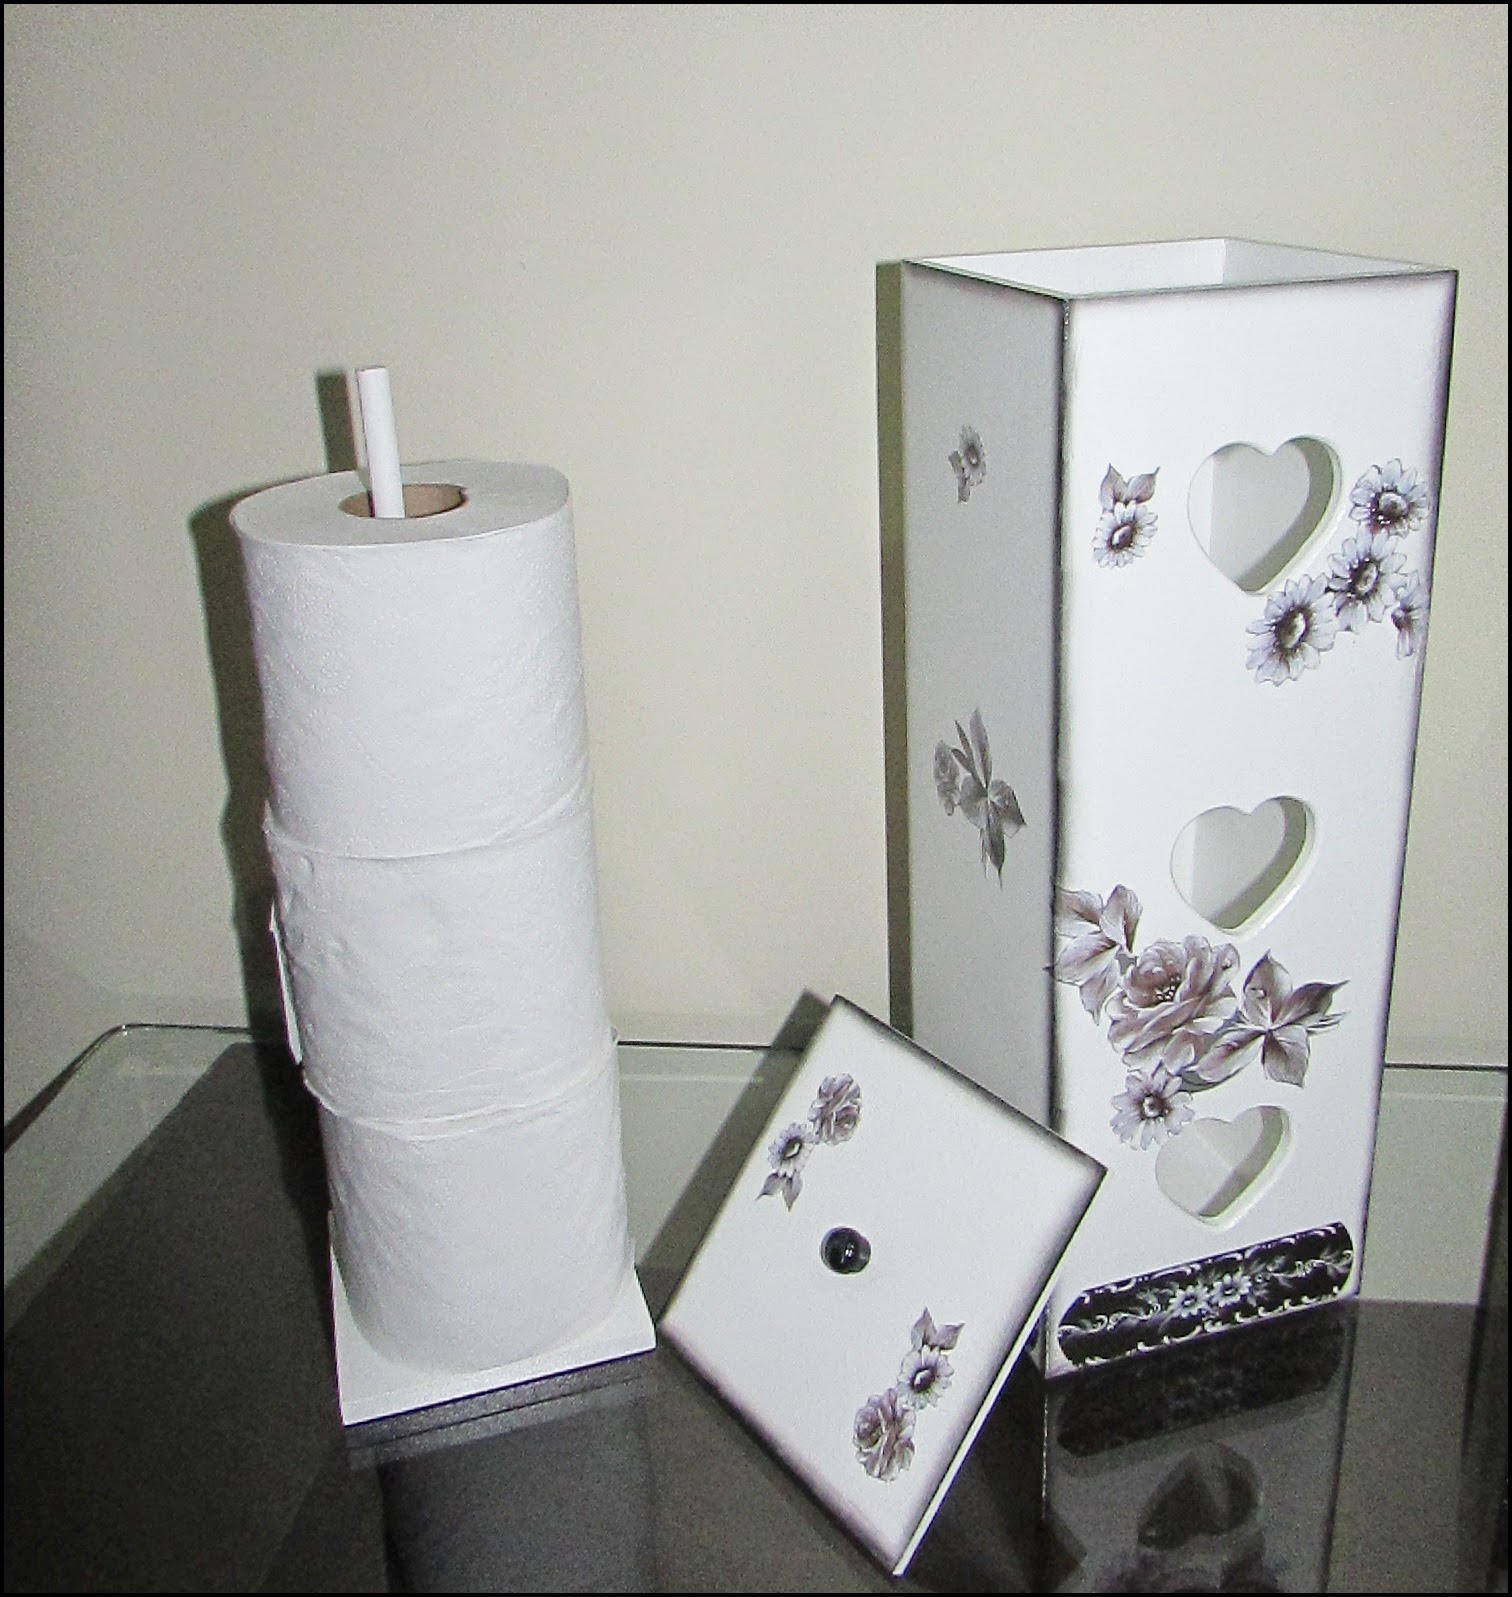 Tutti Belli Artesanatos Kit Banheiro Porta papel higiênico e Lixeira, em md -> Kit Banheiro Mdf Decorado